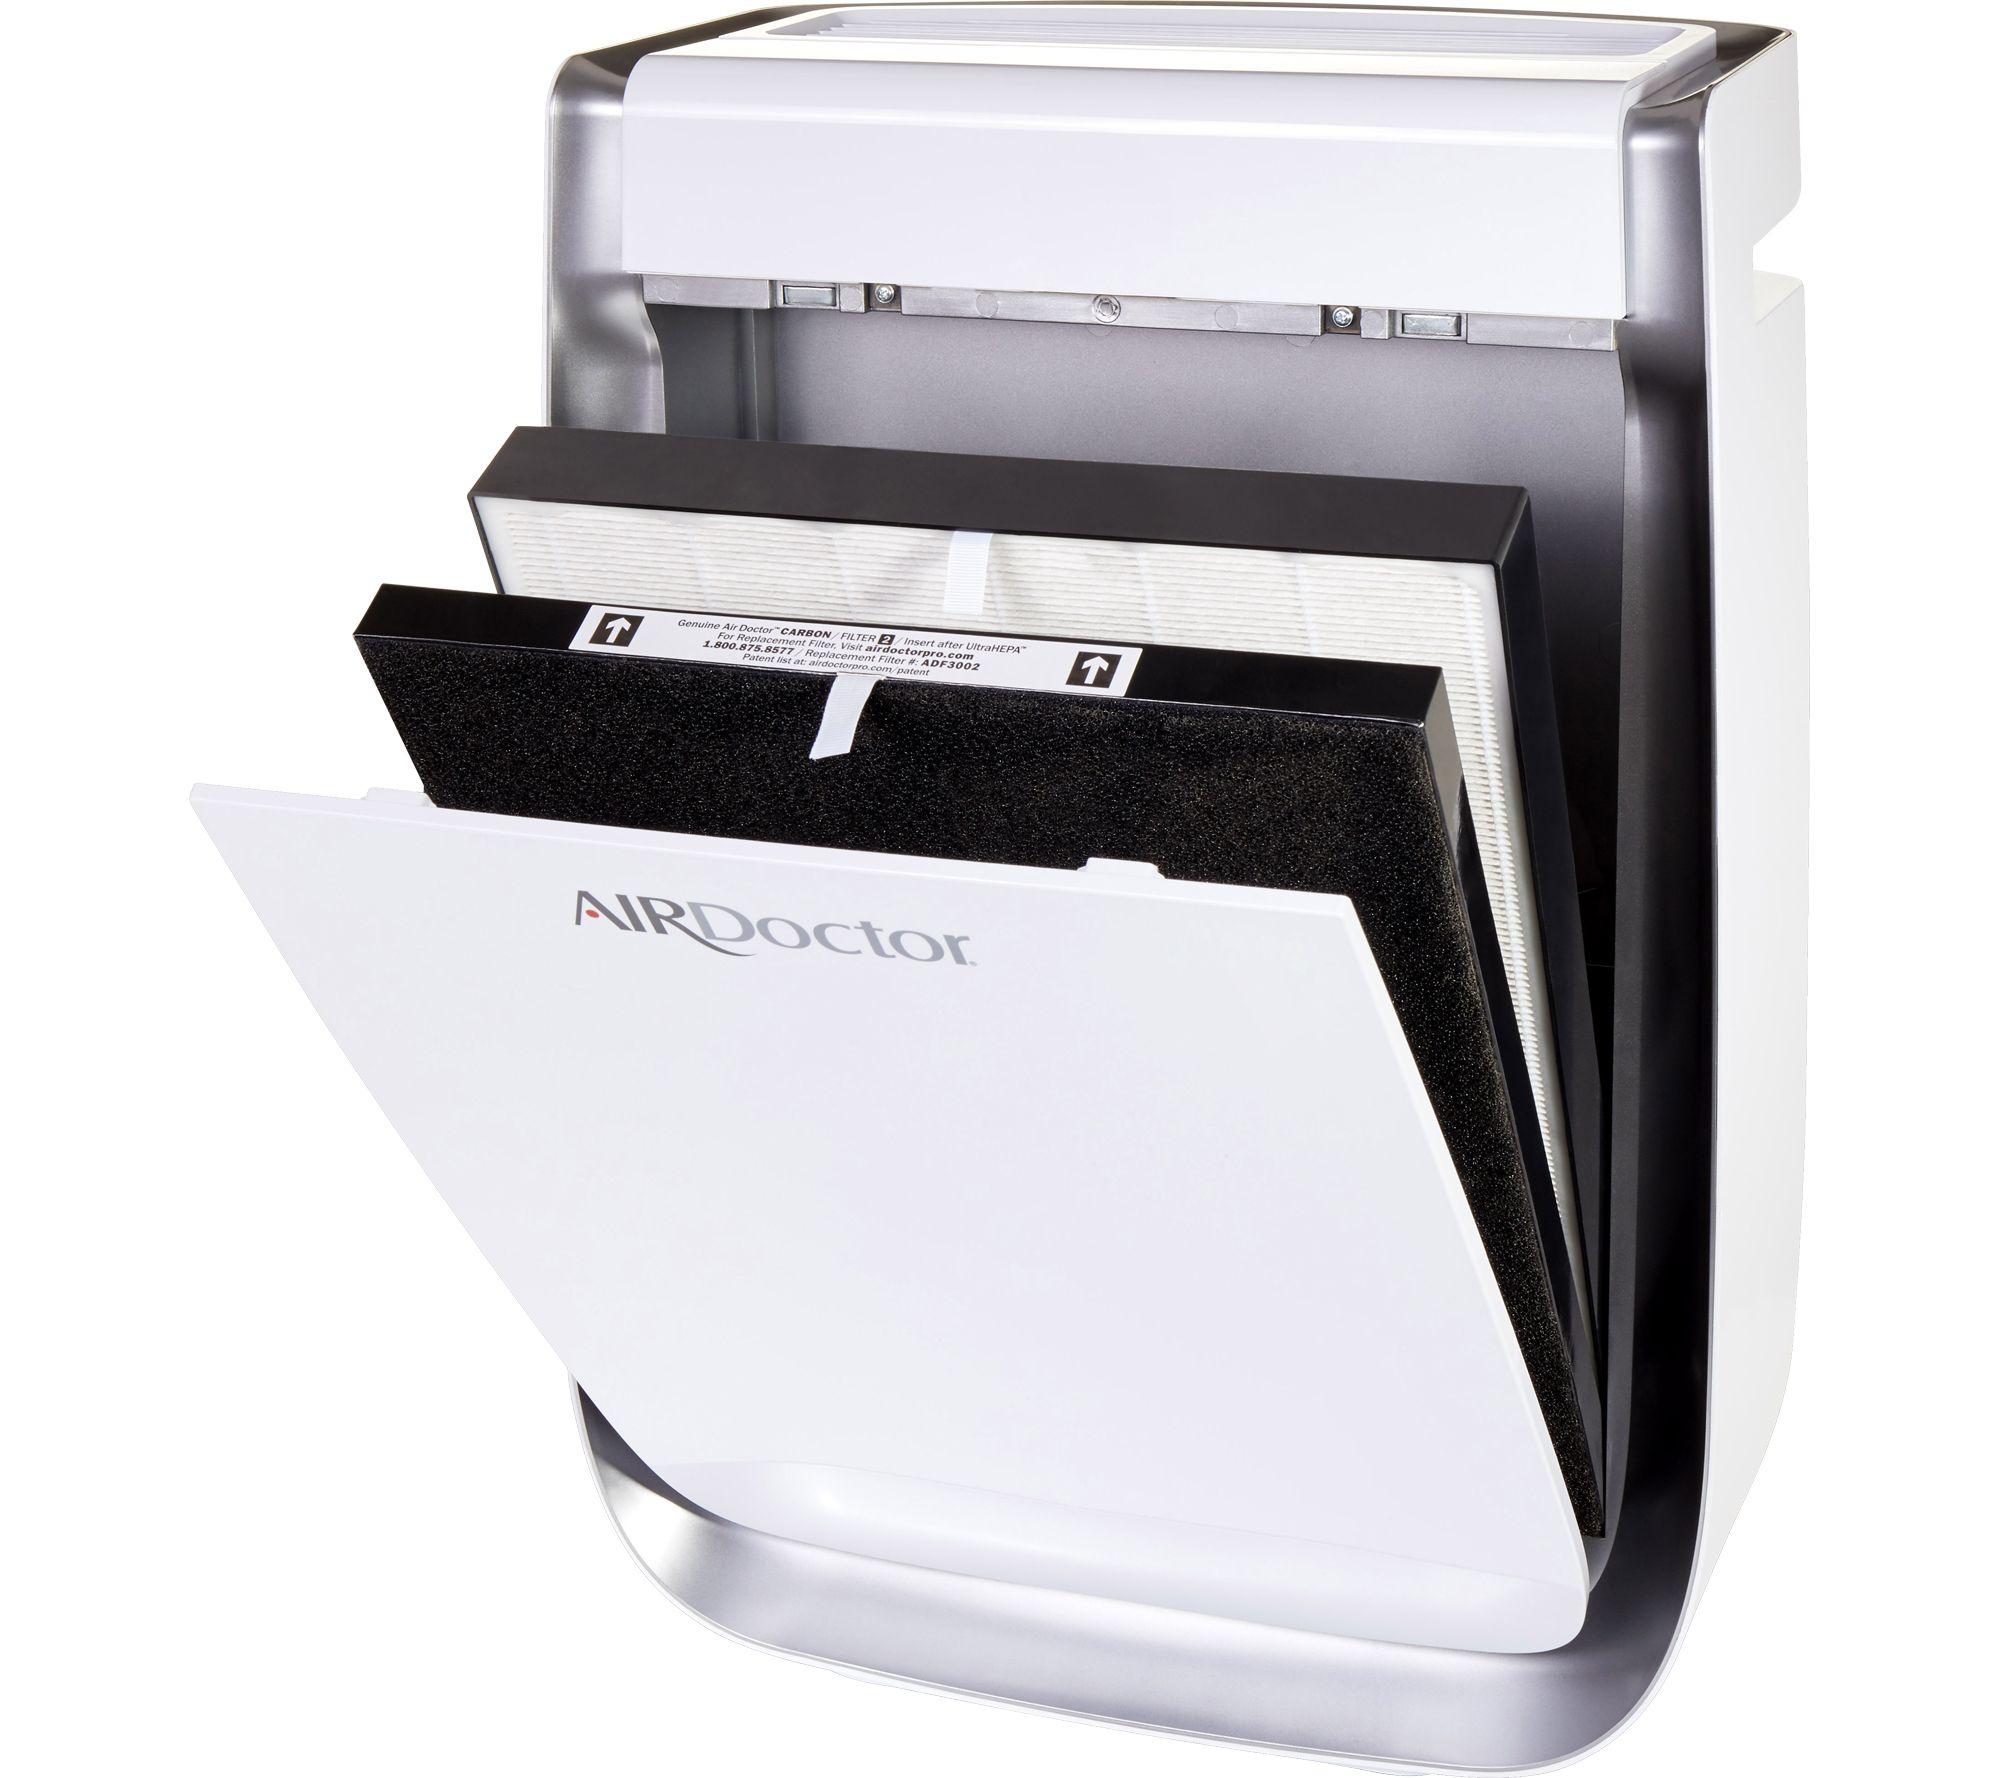 AirDoctor 3000 Professional Air Purifier - QVC.com